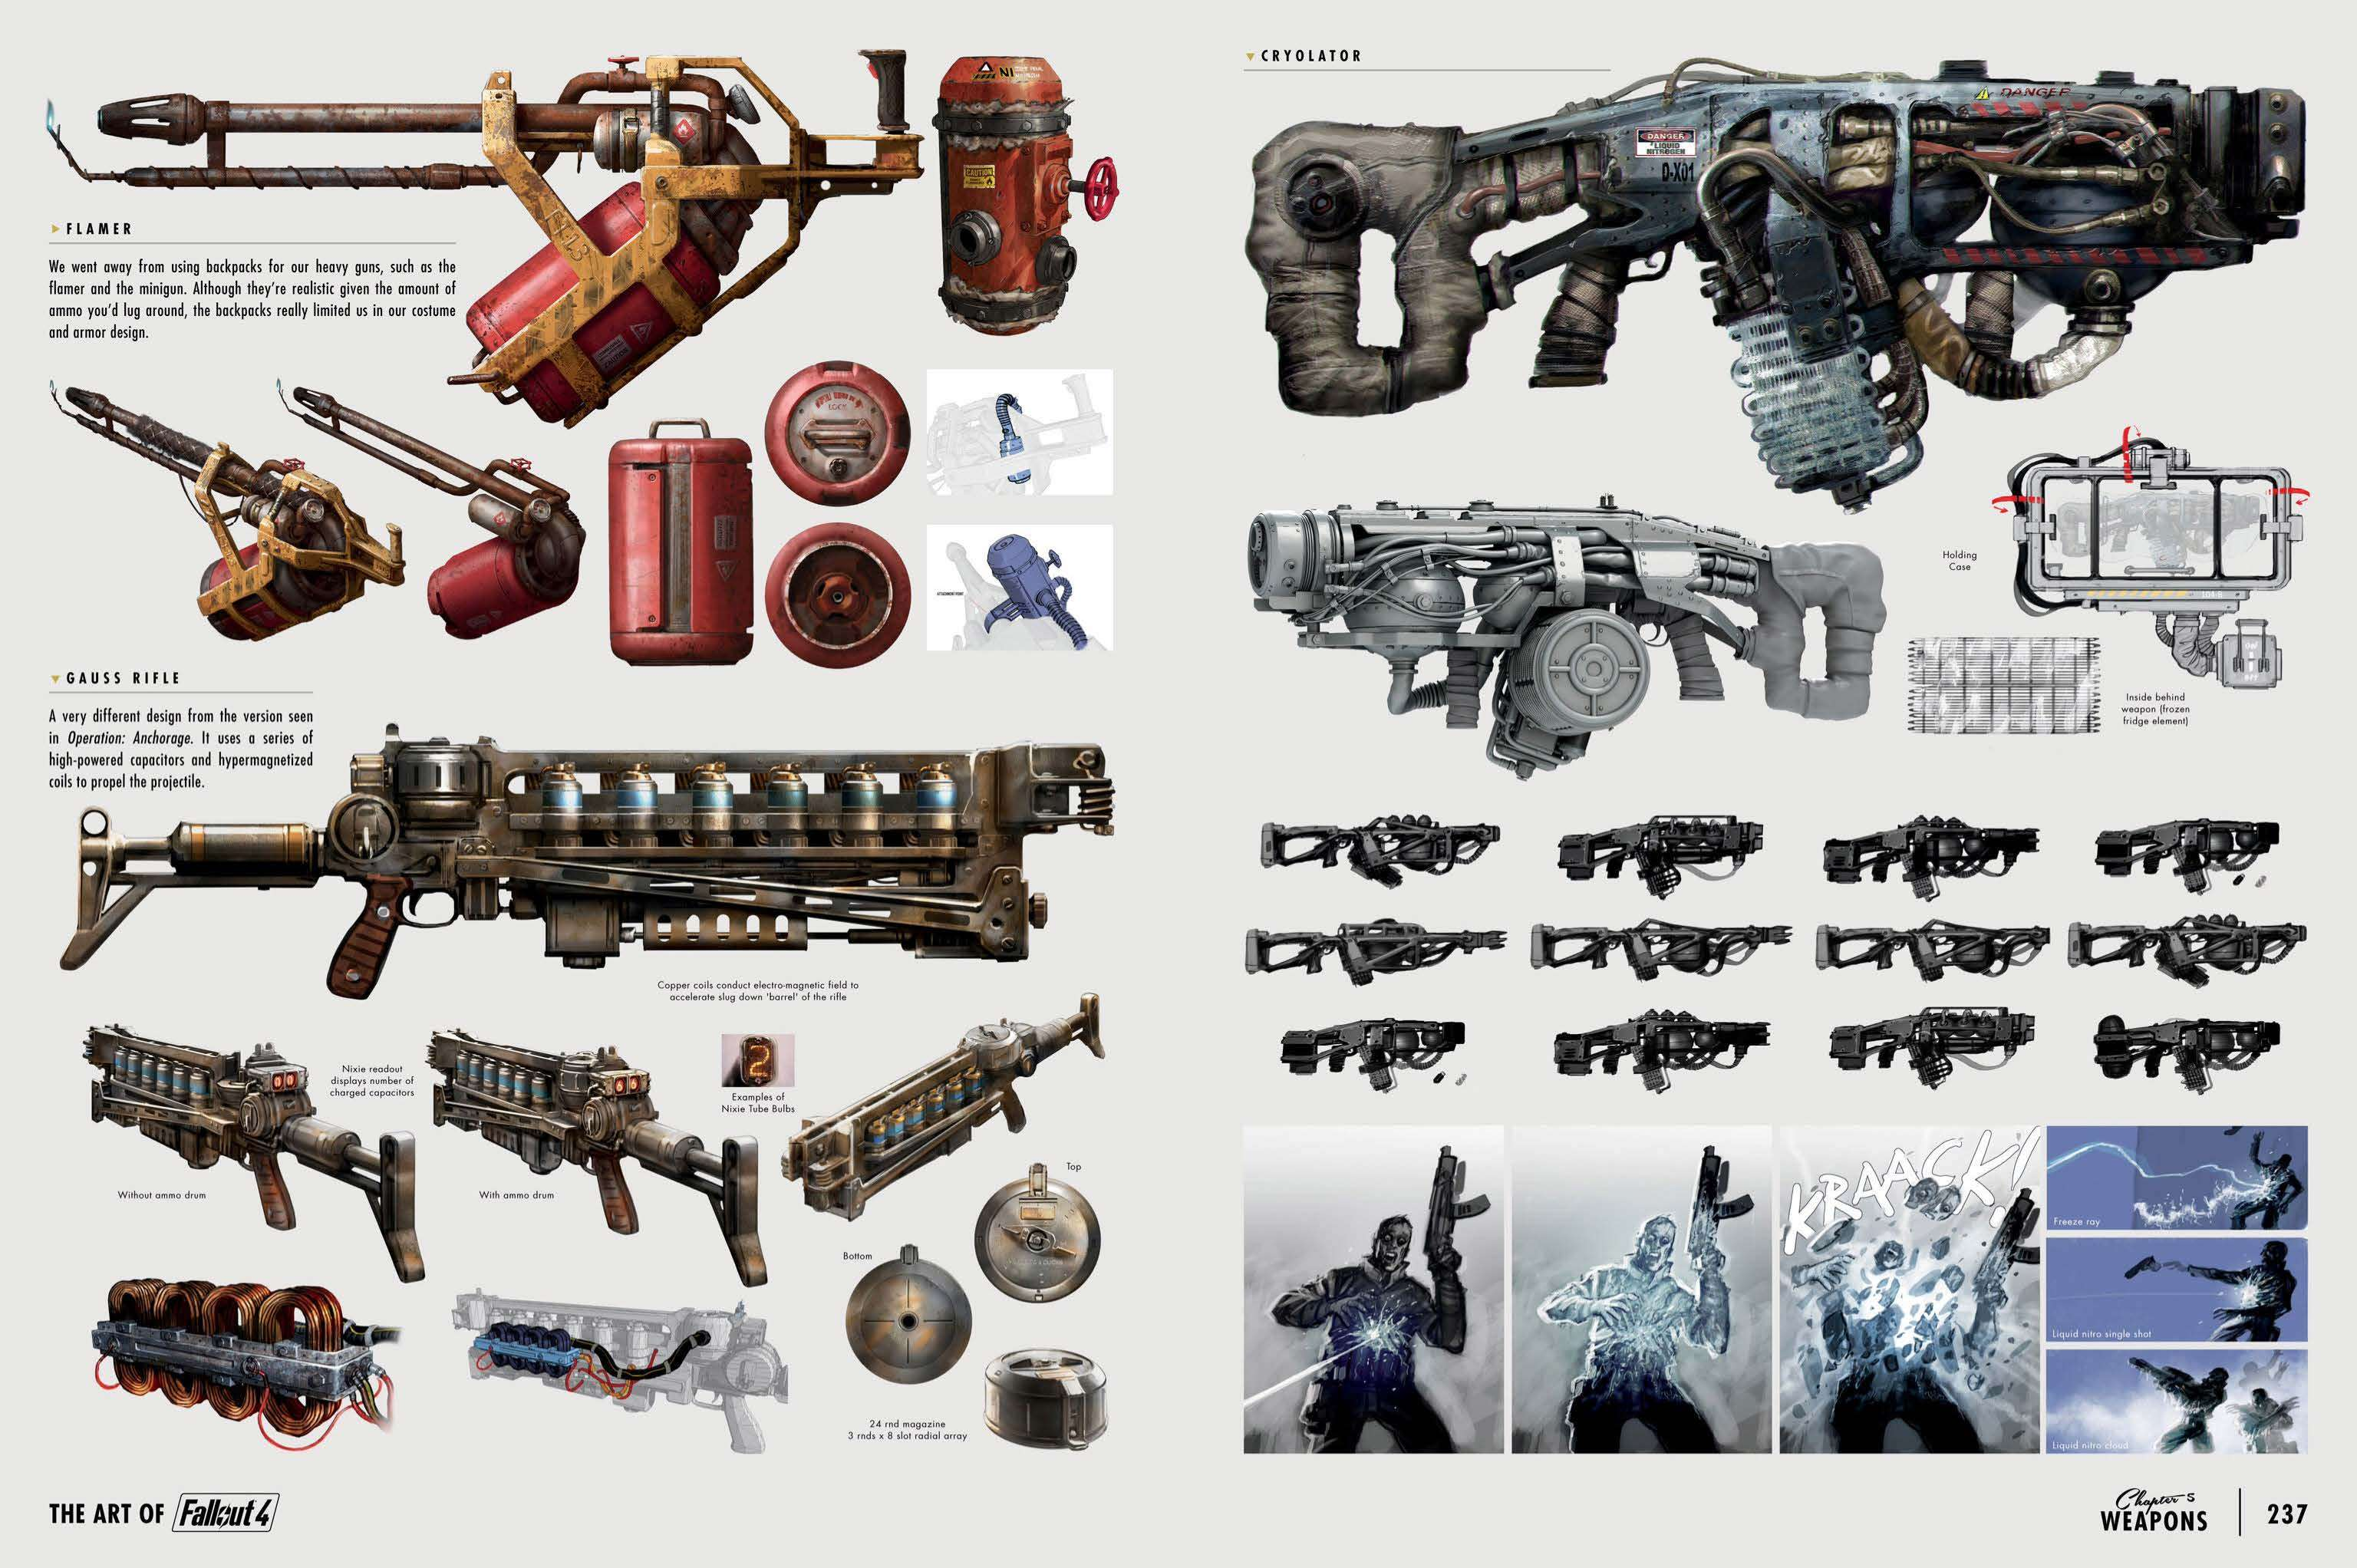 The Art of Fallout 4 - # 119 - Fallout 4 арт